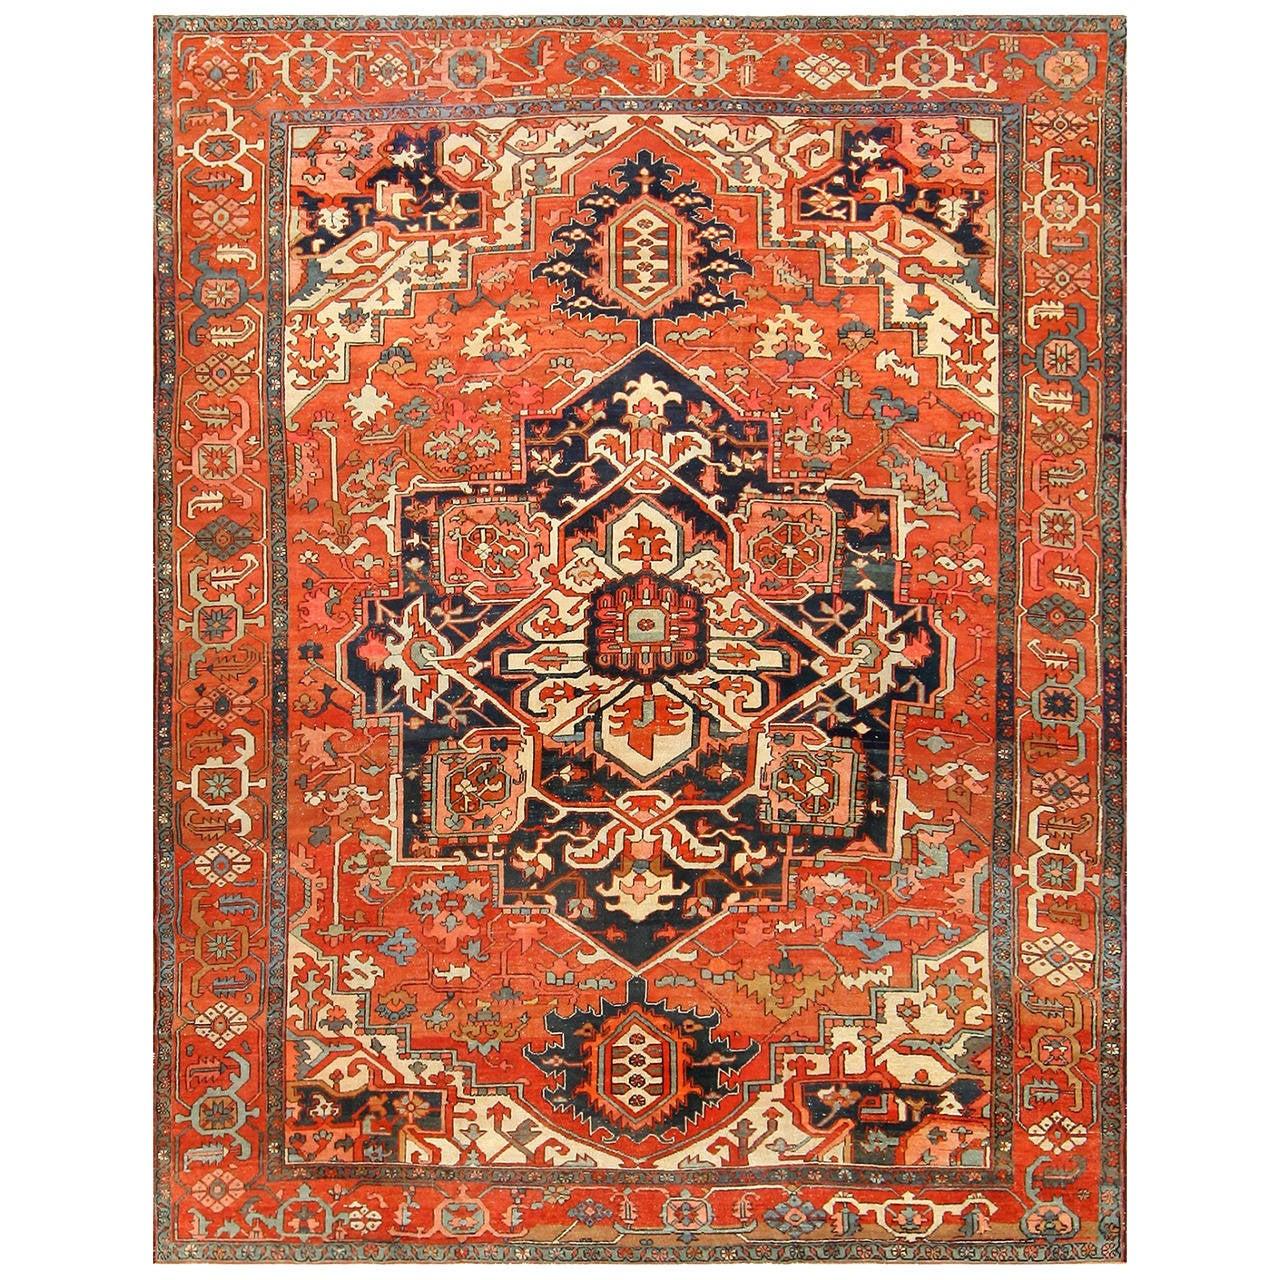 Beautiful Antique Persian Serapi Rug At 1stdibs